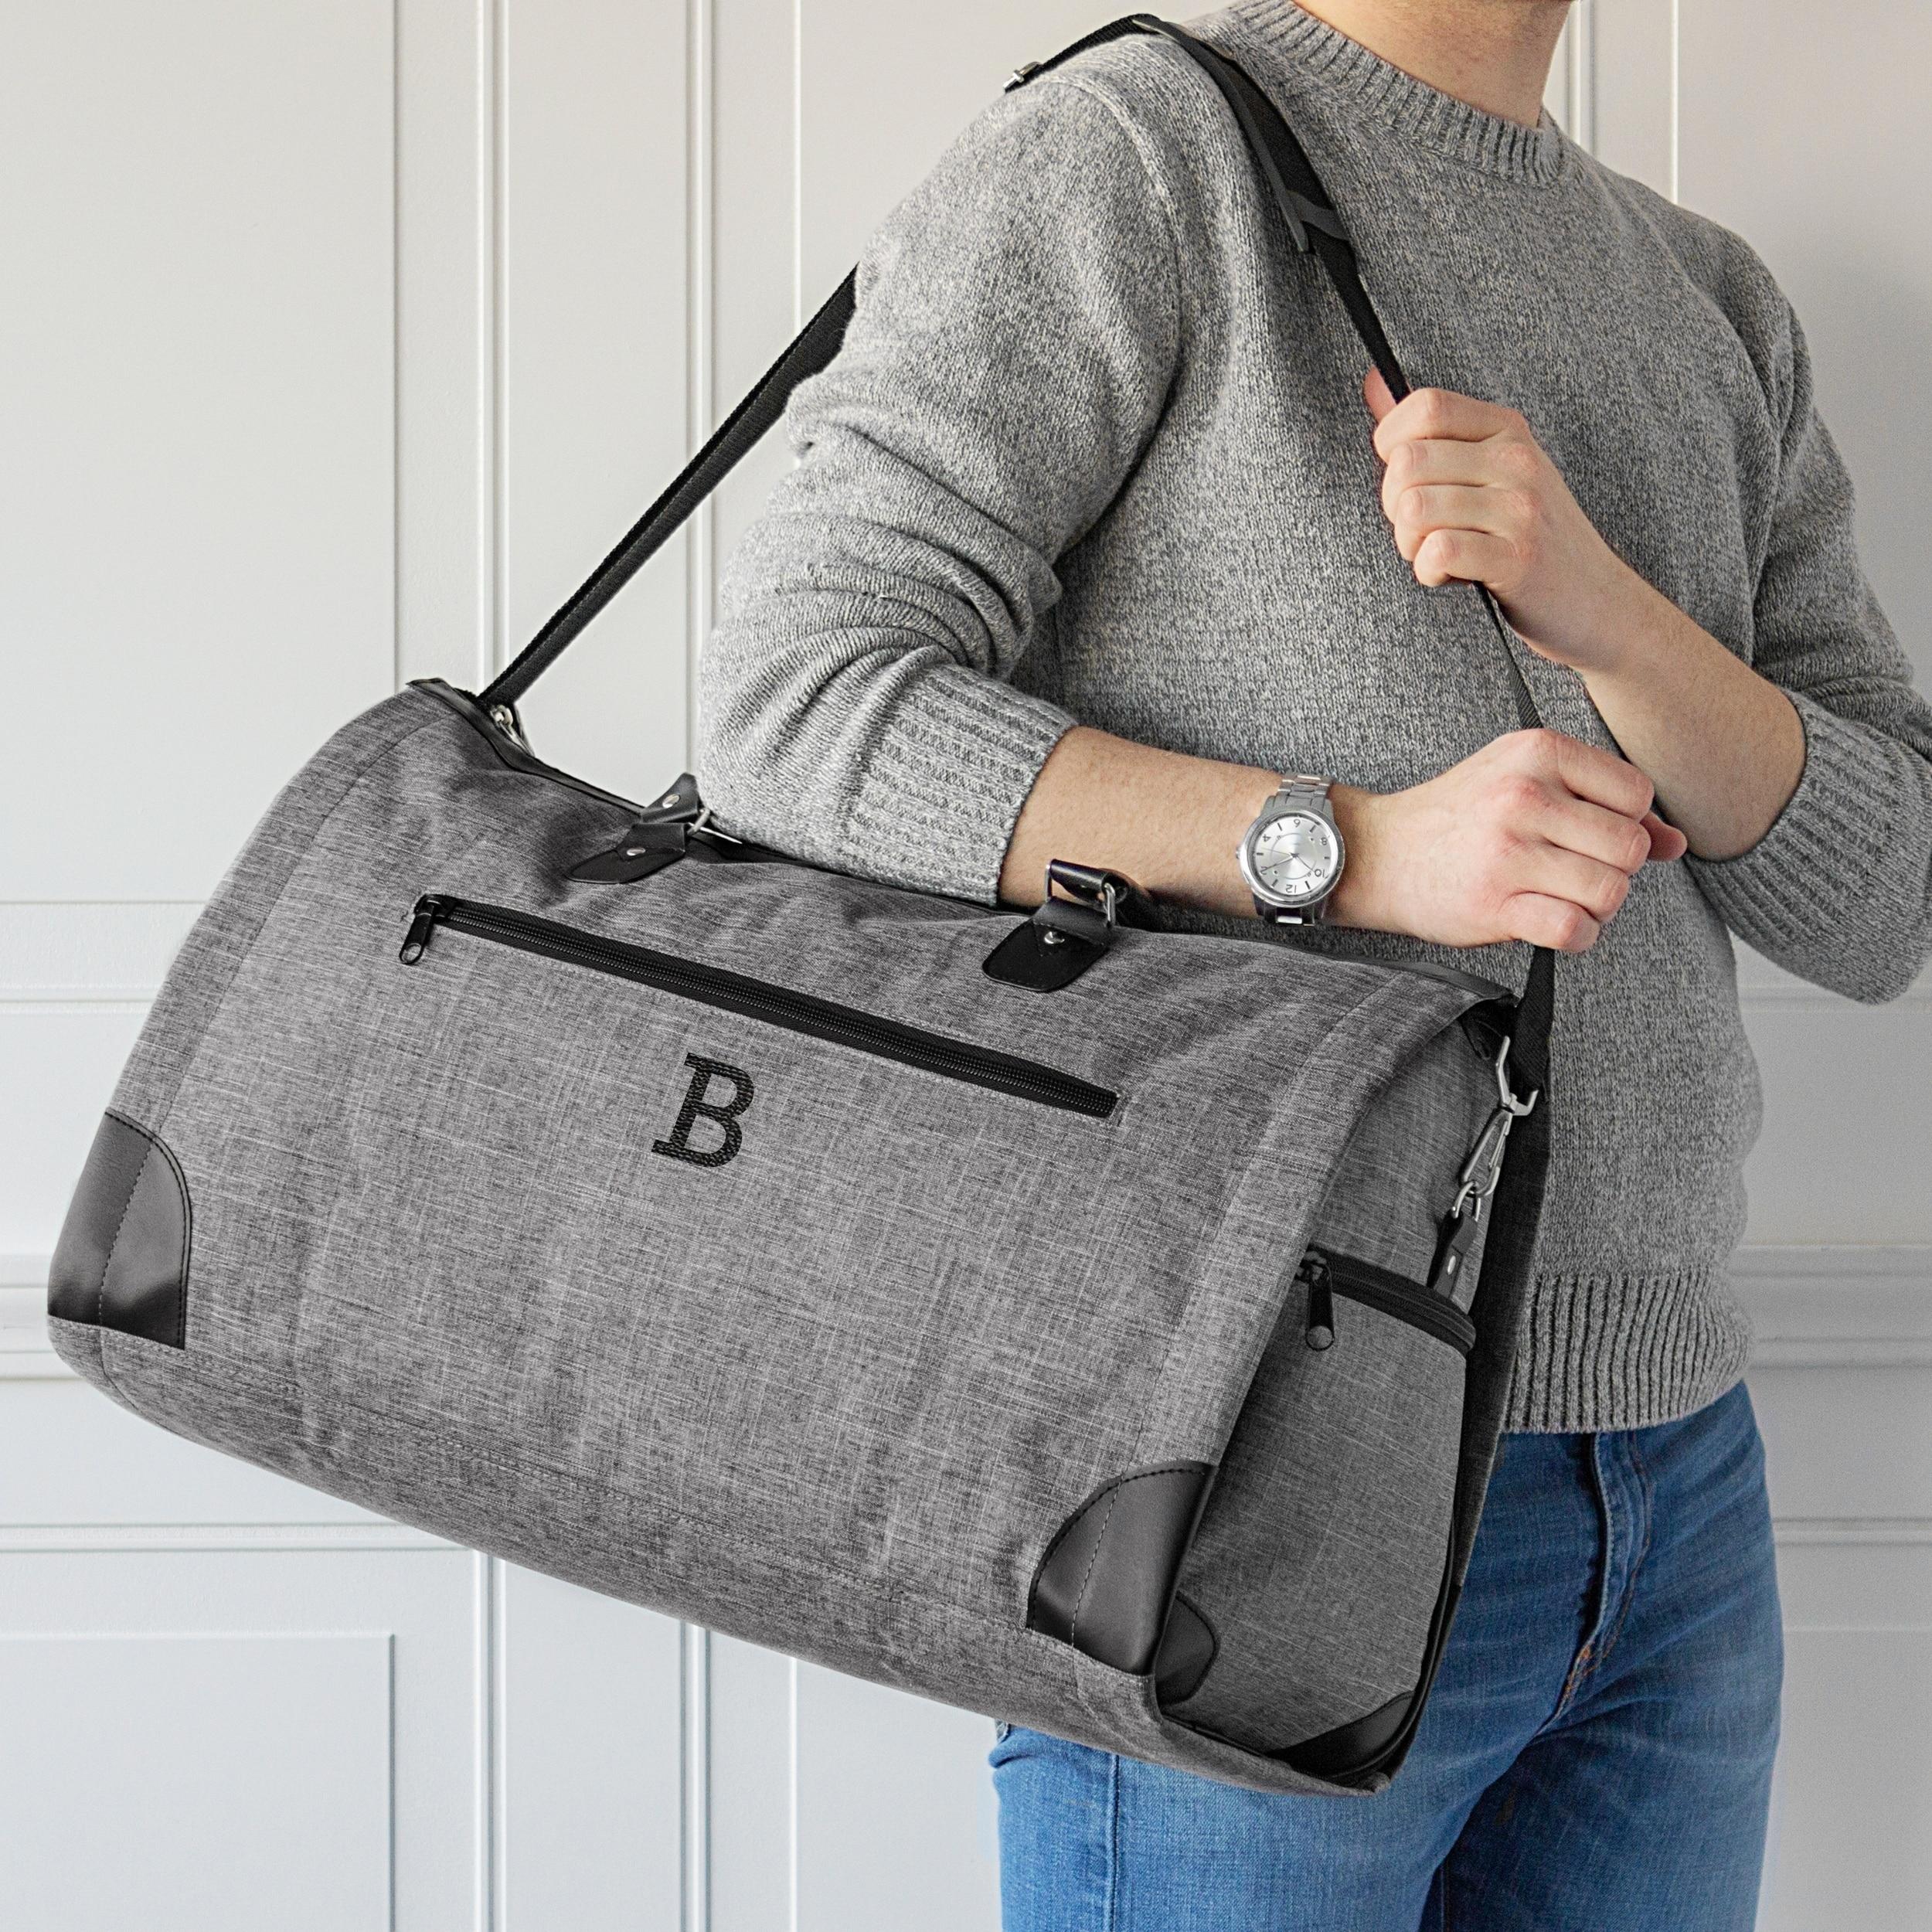 Shop Personalized Grey Convertible Garment Bag Duffel Bag - Free ... 5194f02a356fe